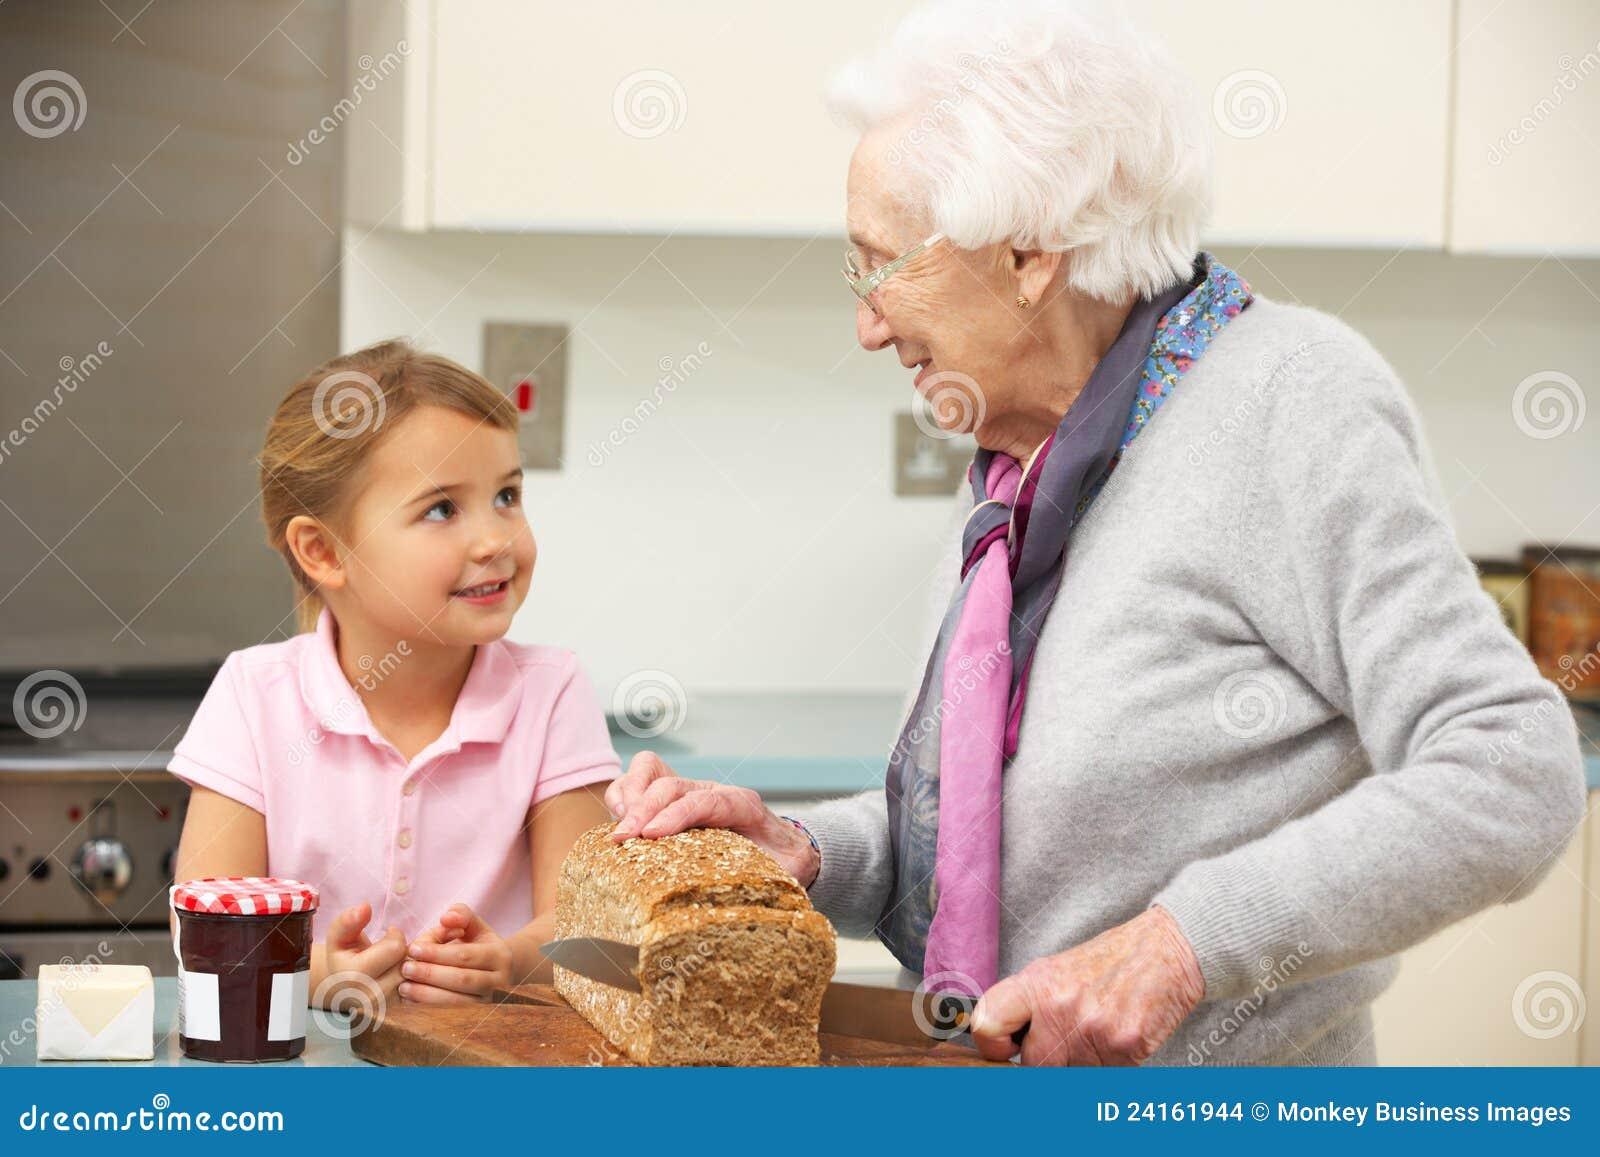 С бабушкой на кухне 22 фотография